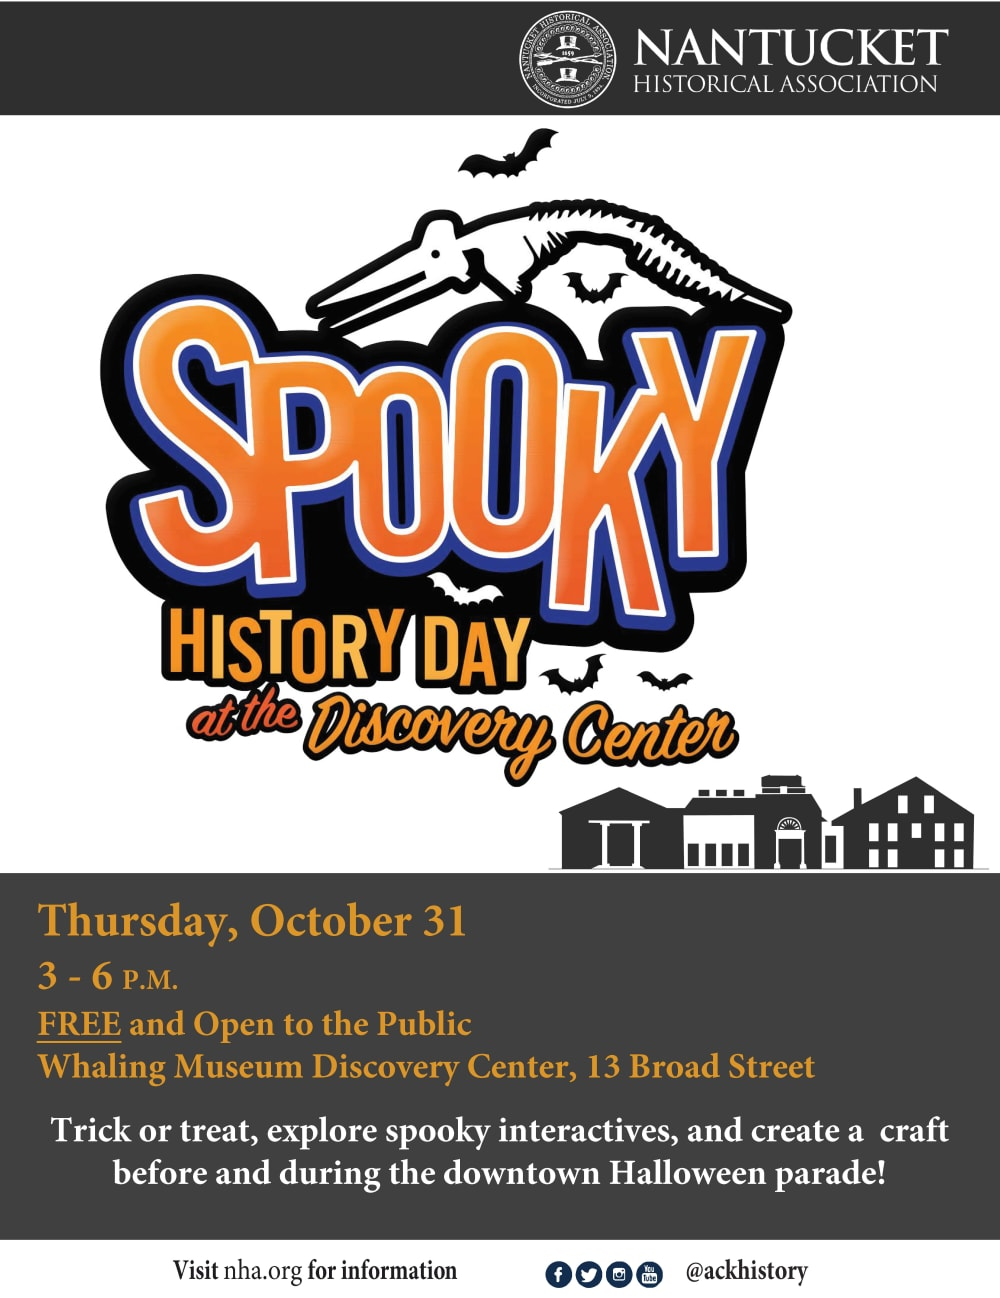 Spooky-History-Flyer-NHA.jpg